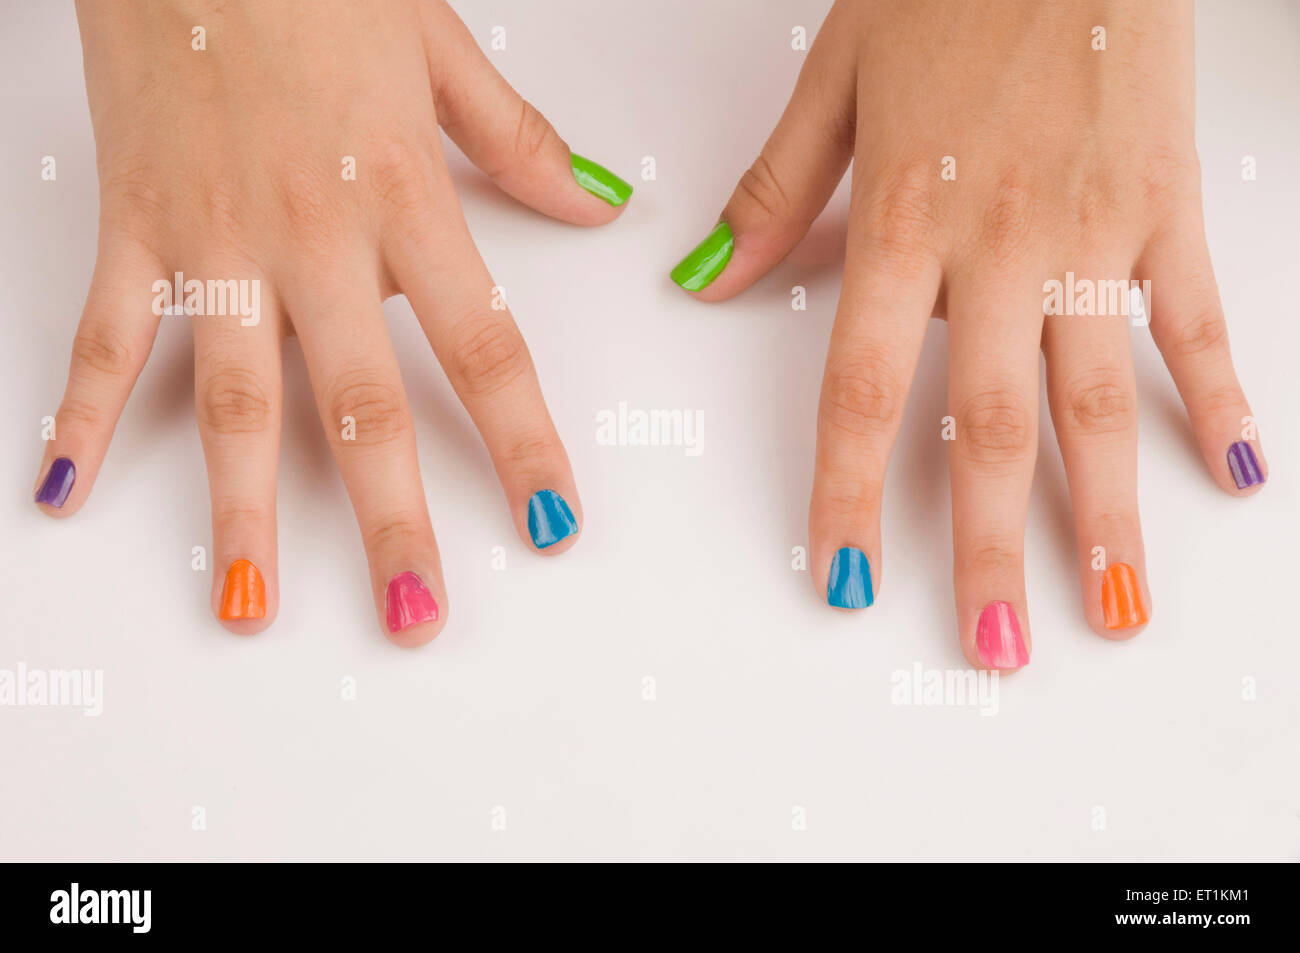 Different colours of nail polish on nails Pune Maharashtra India Asia May 2011 - Stock Image